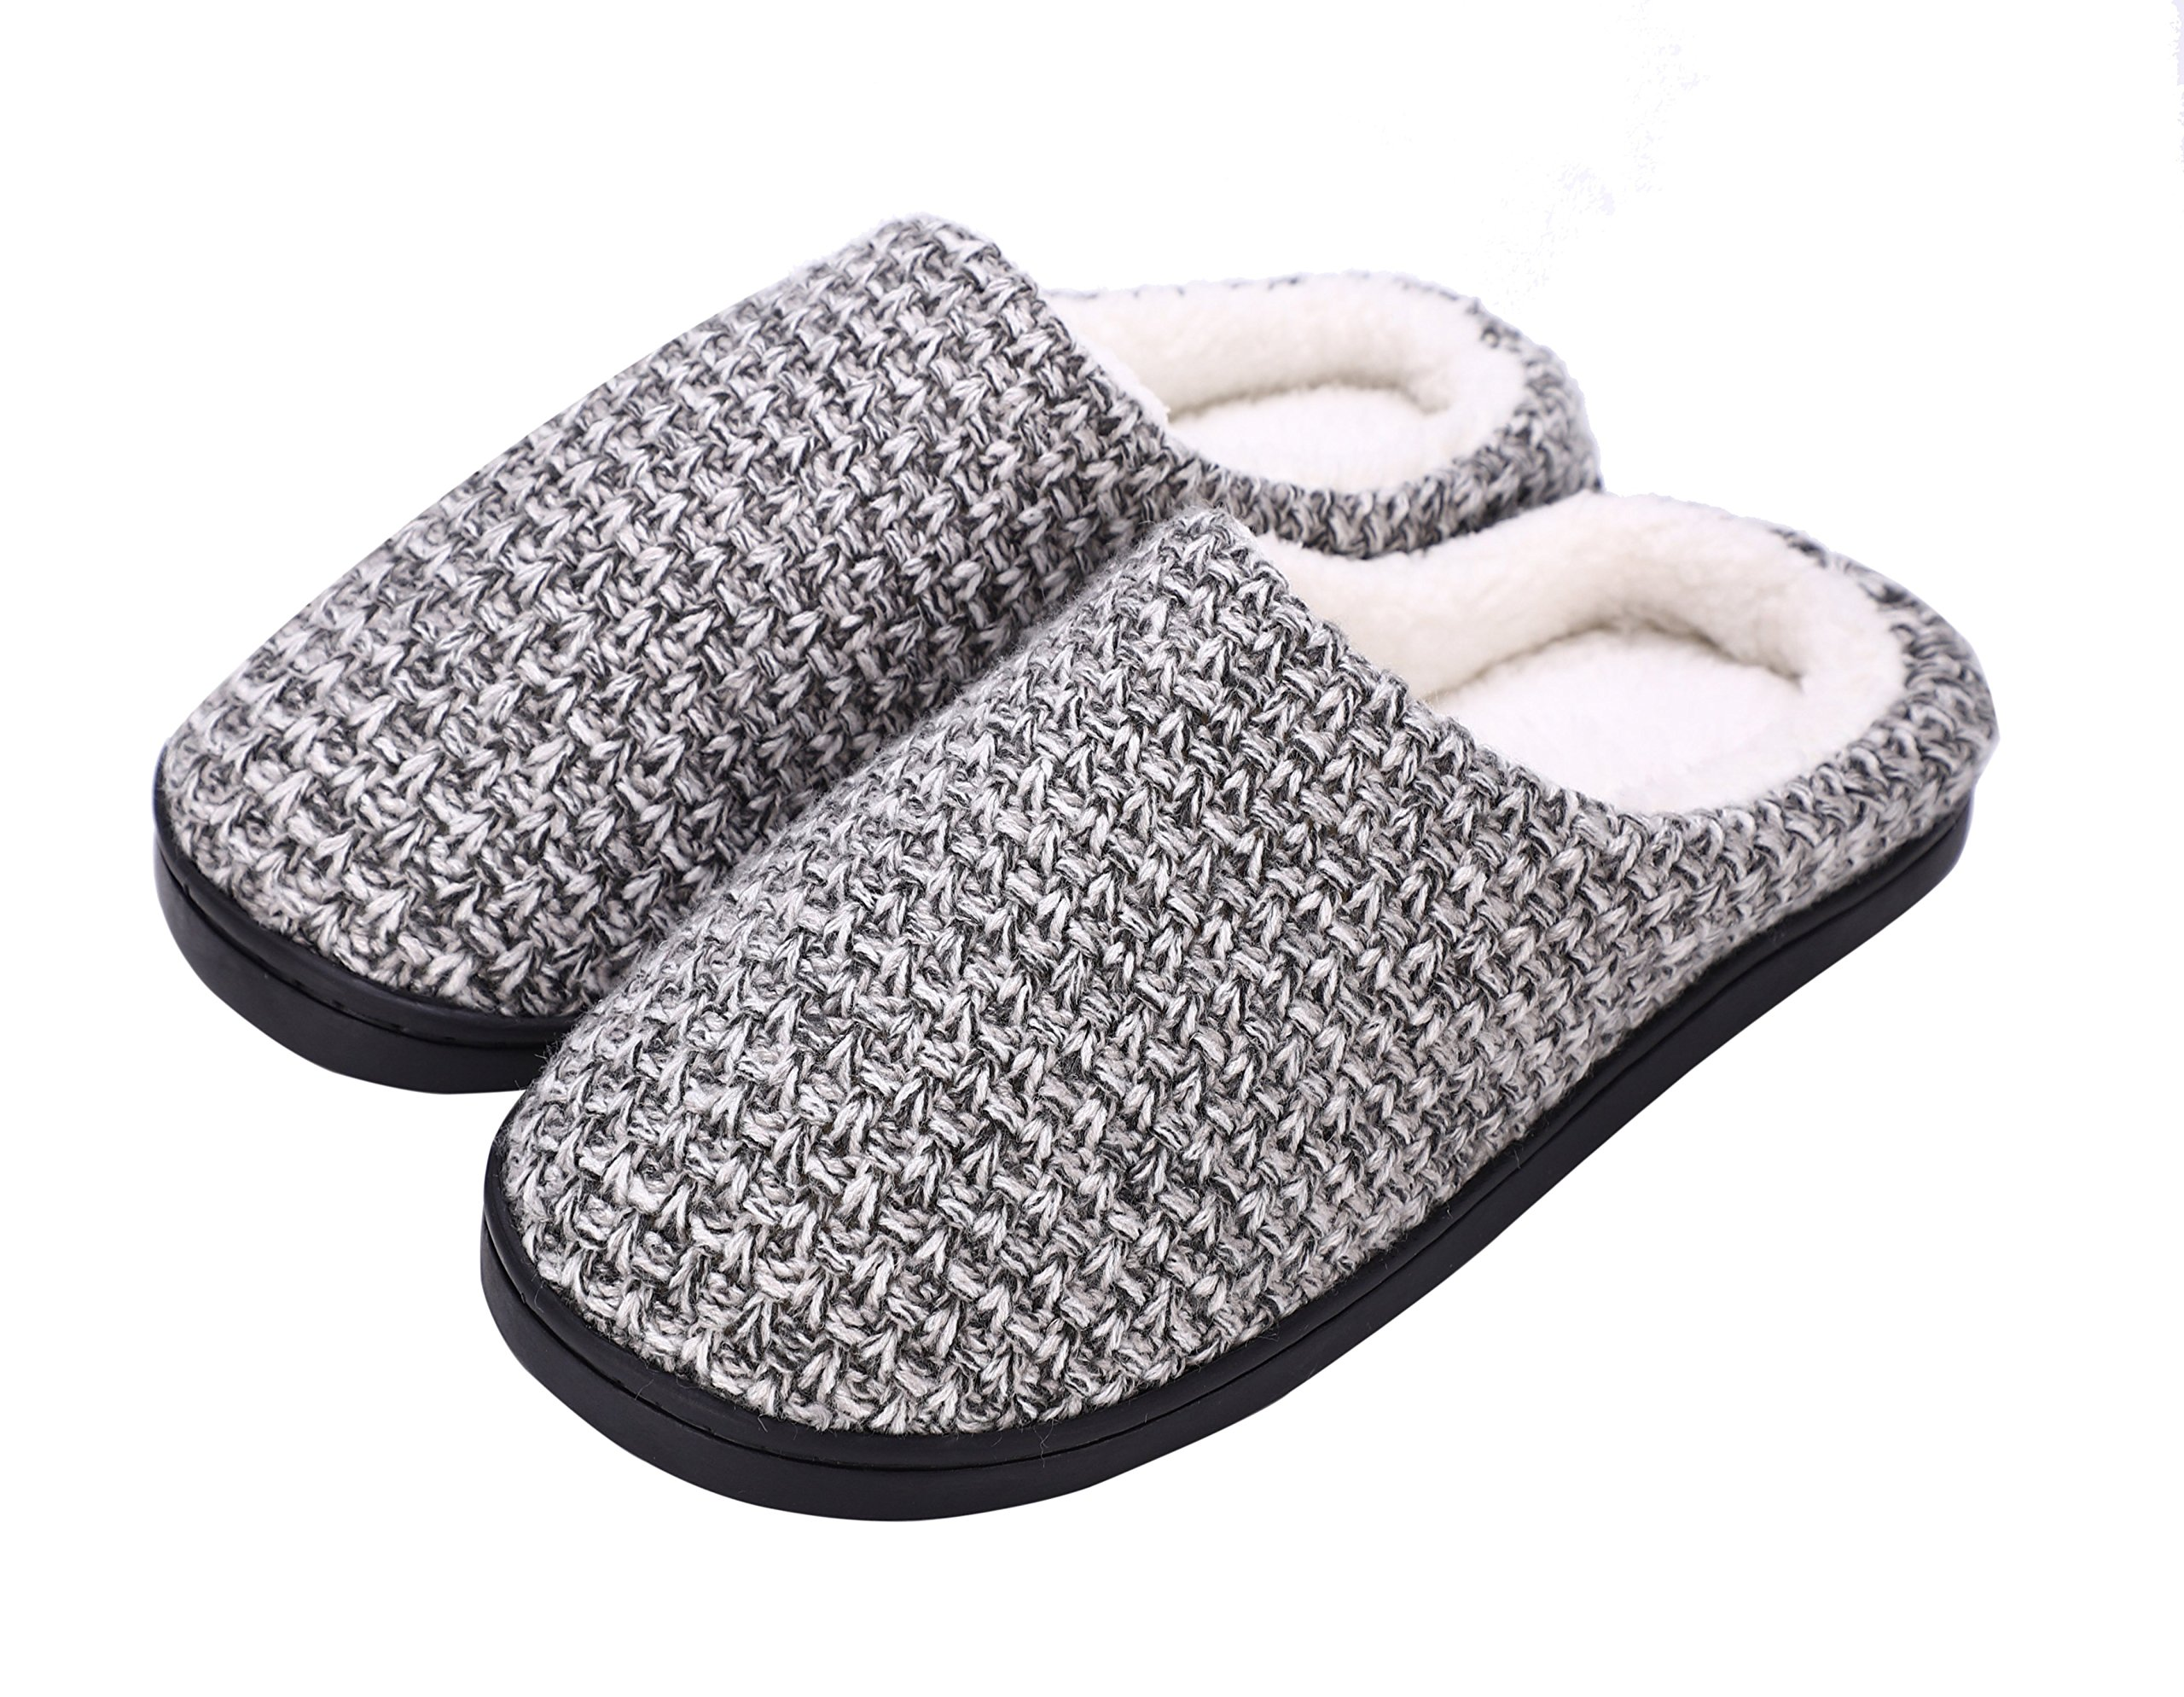 DRSLPAR House Memory Foam Slippers Comfort Plush Lining Slip-on Knit Indoor Outdoor Shoes for Men Women(Grey-Beige X-Large) by DRSLPAR (Image #7)